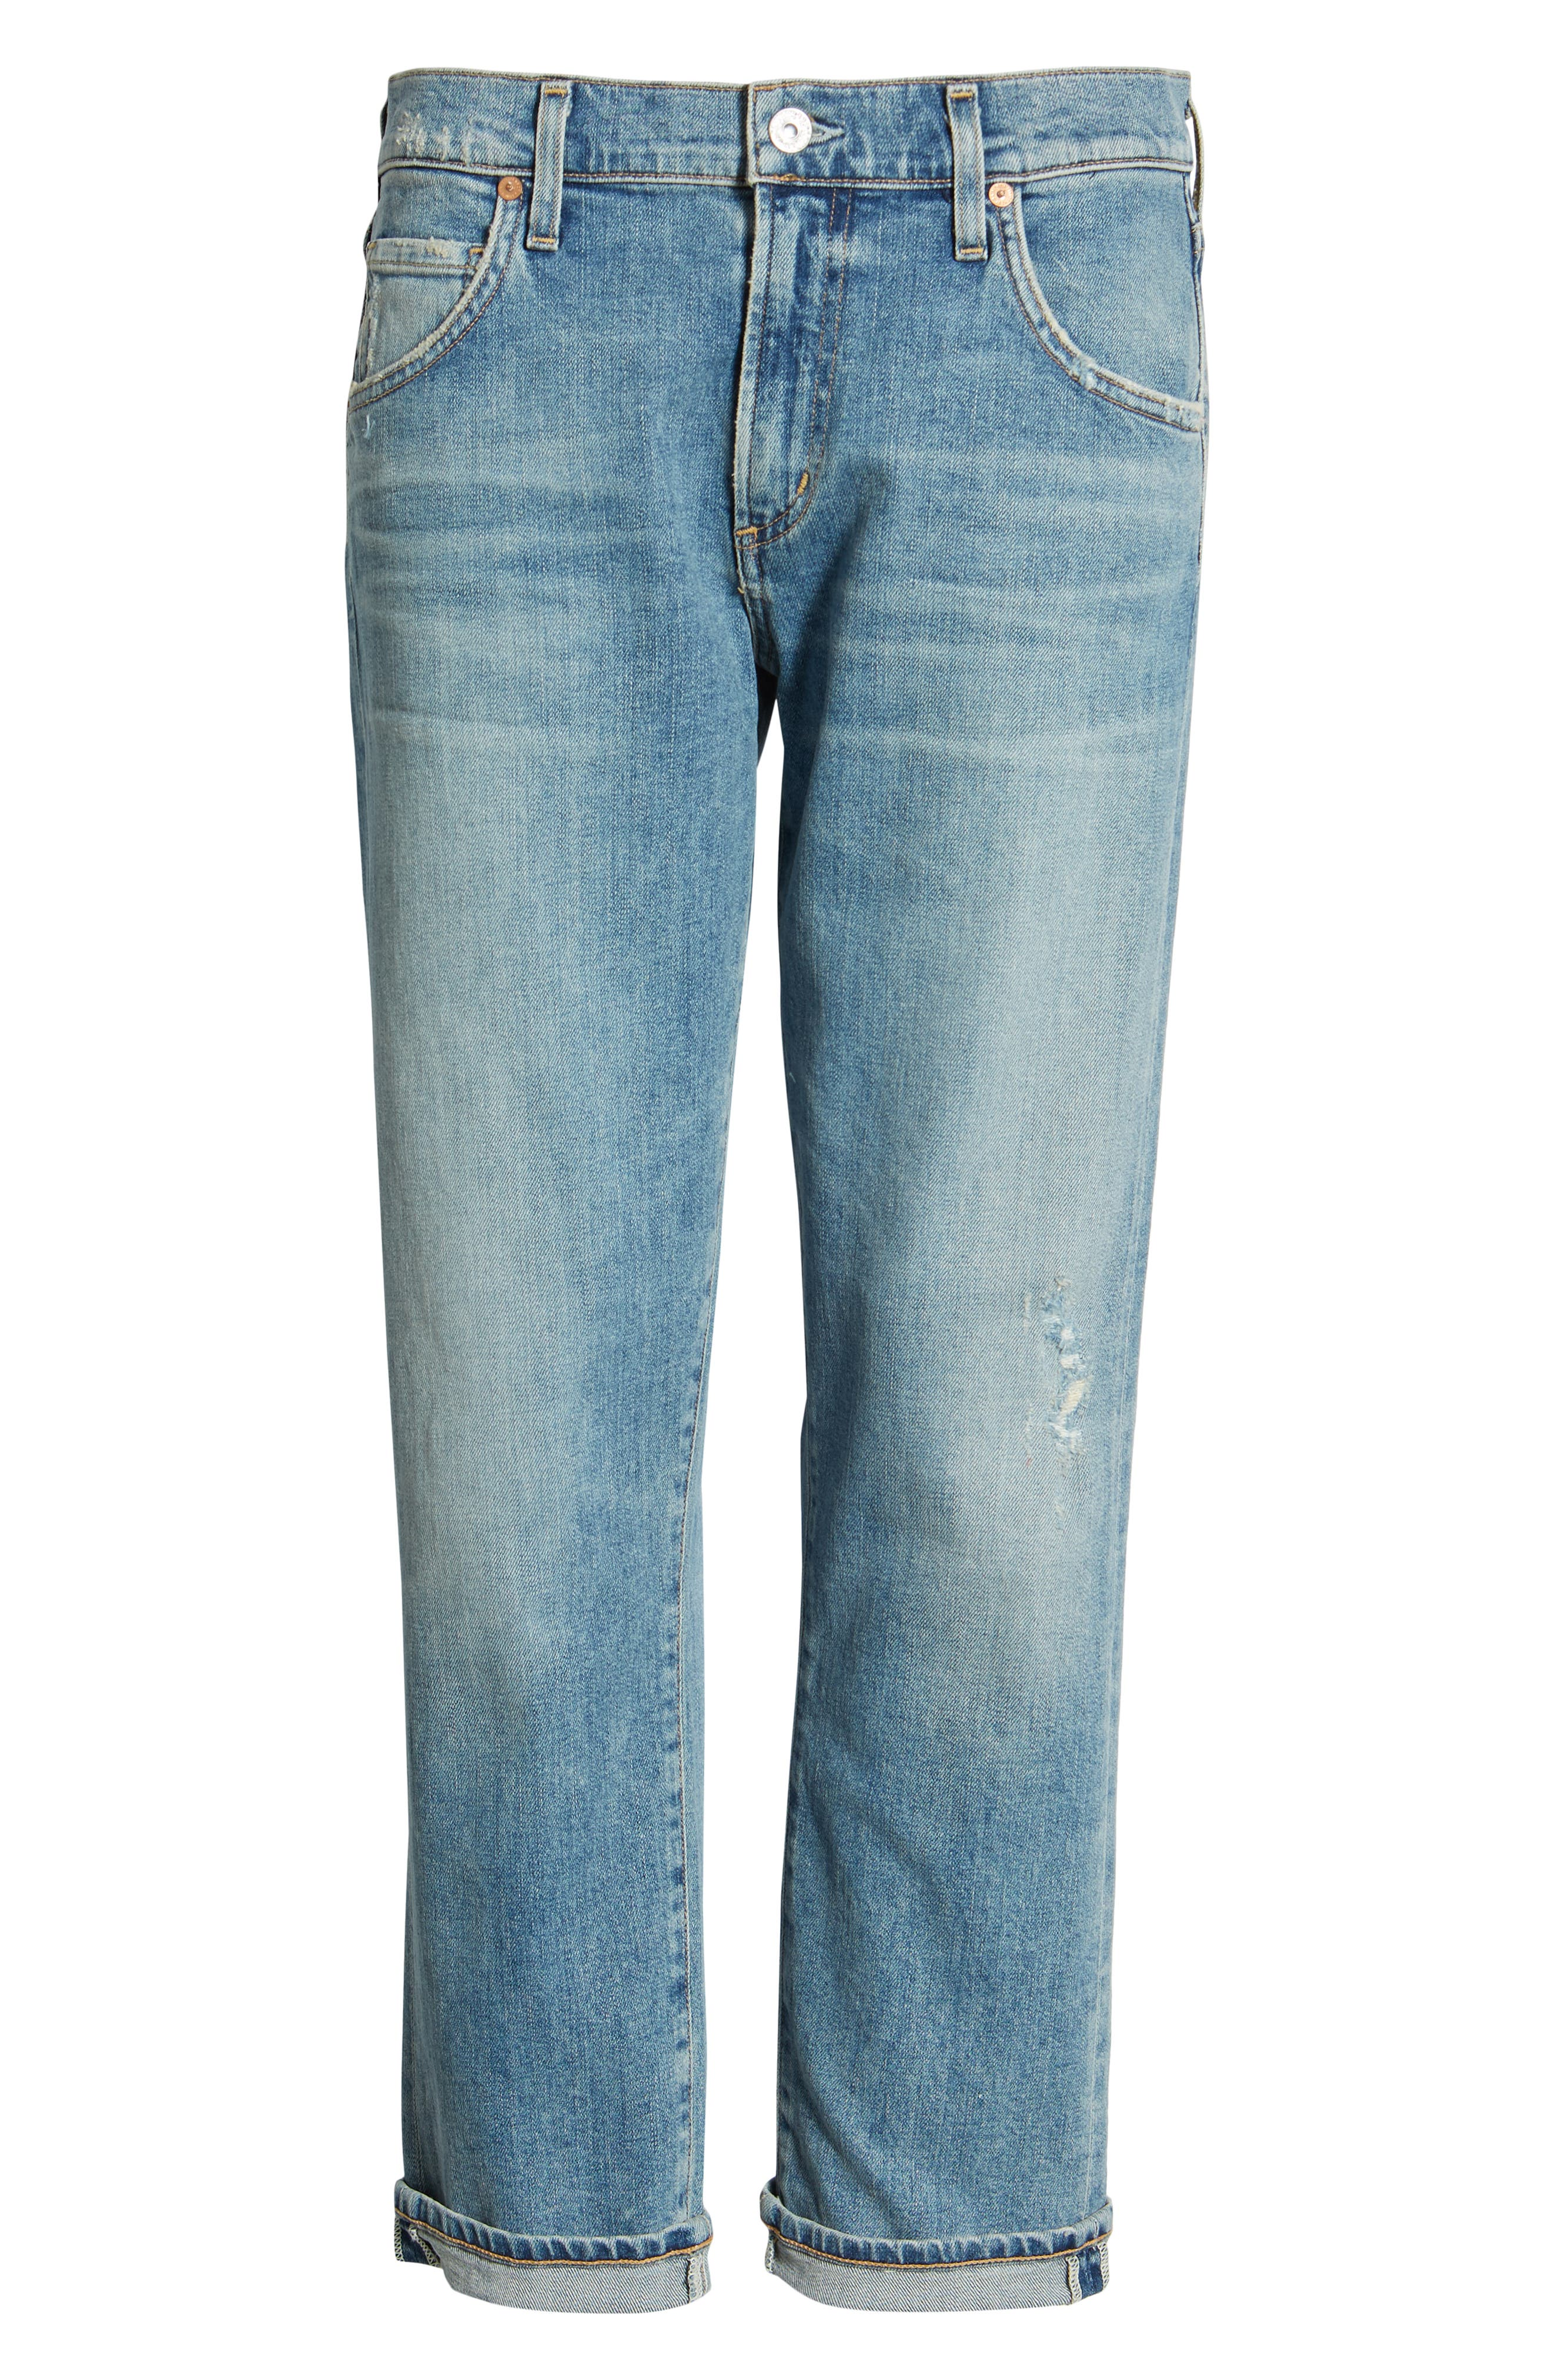 CITIZENS OF HUMANITY, Emerson Crop Slim Fit Boyfriend Jeans, Alternate thumbnail 7, color, MARINA